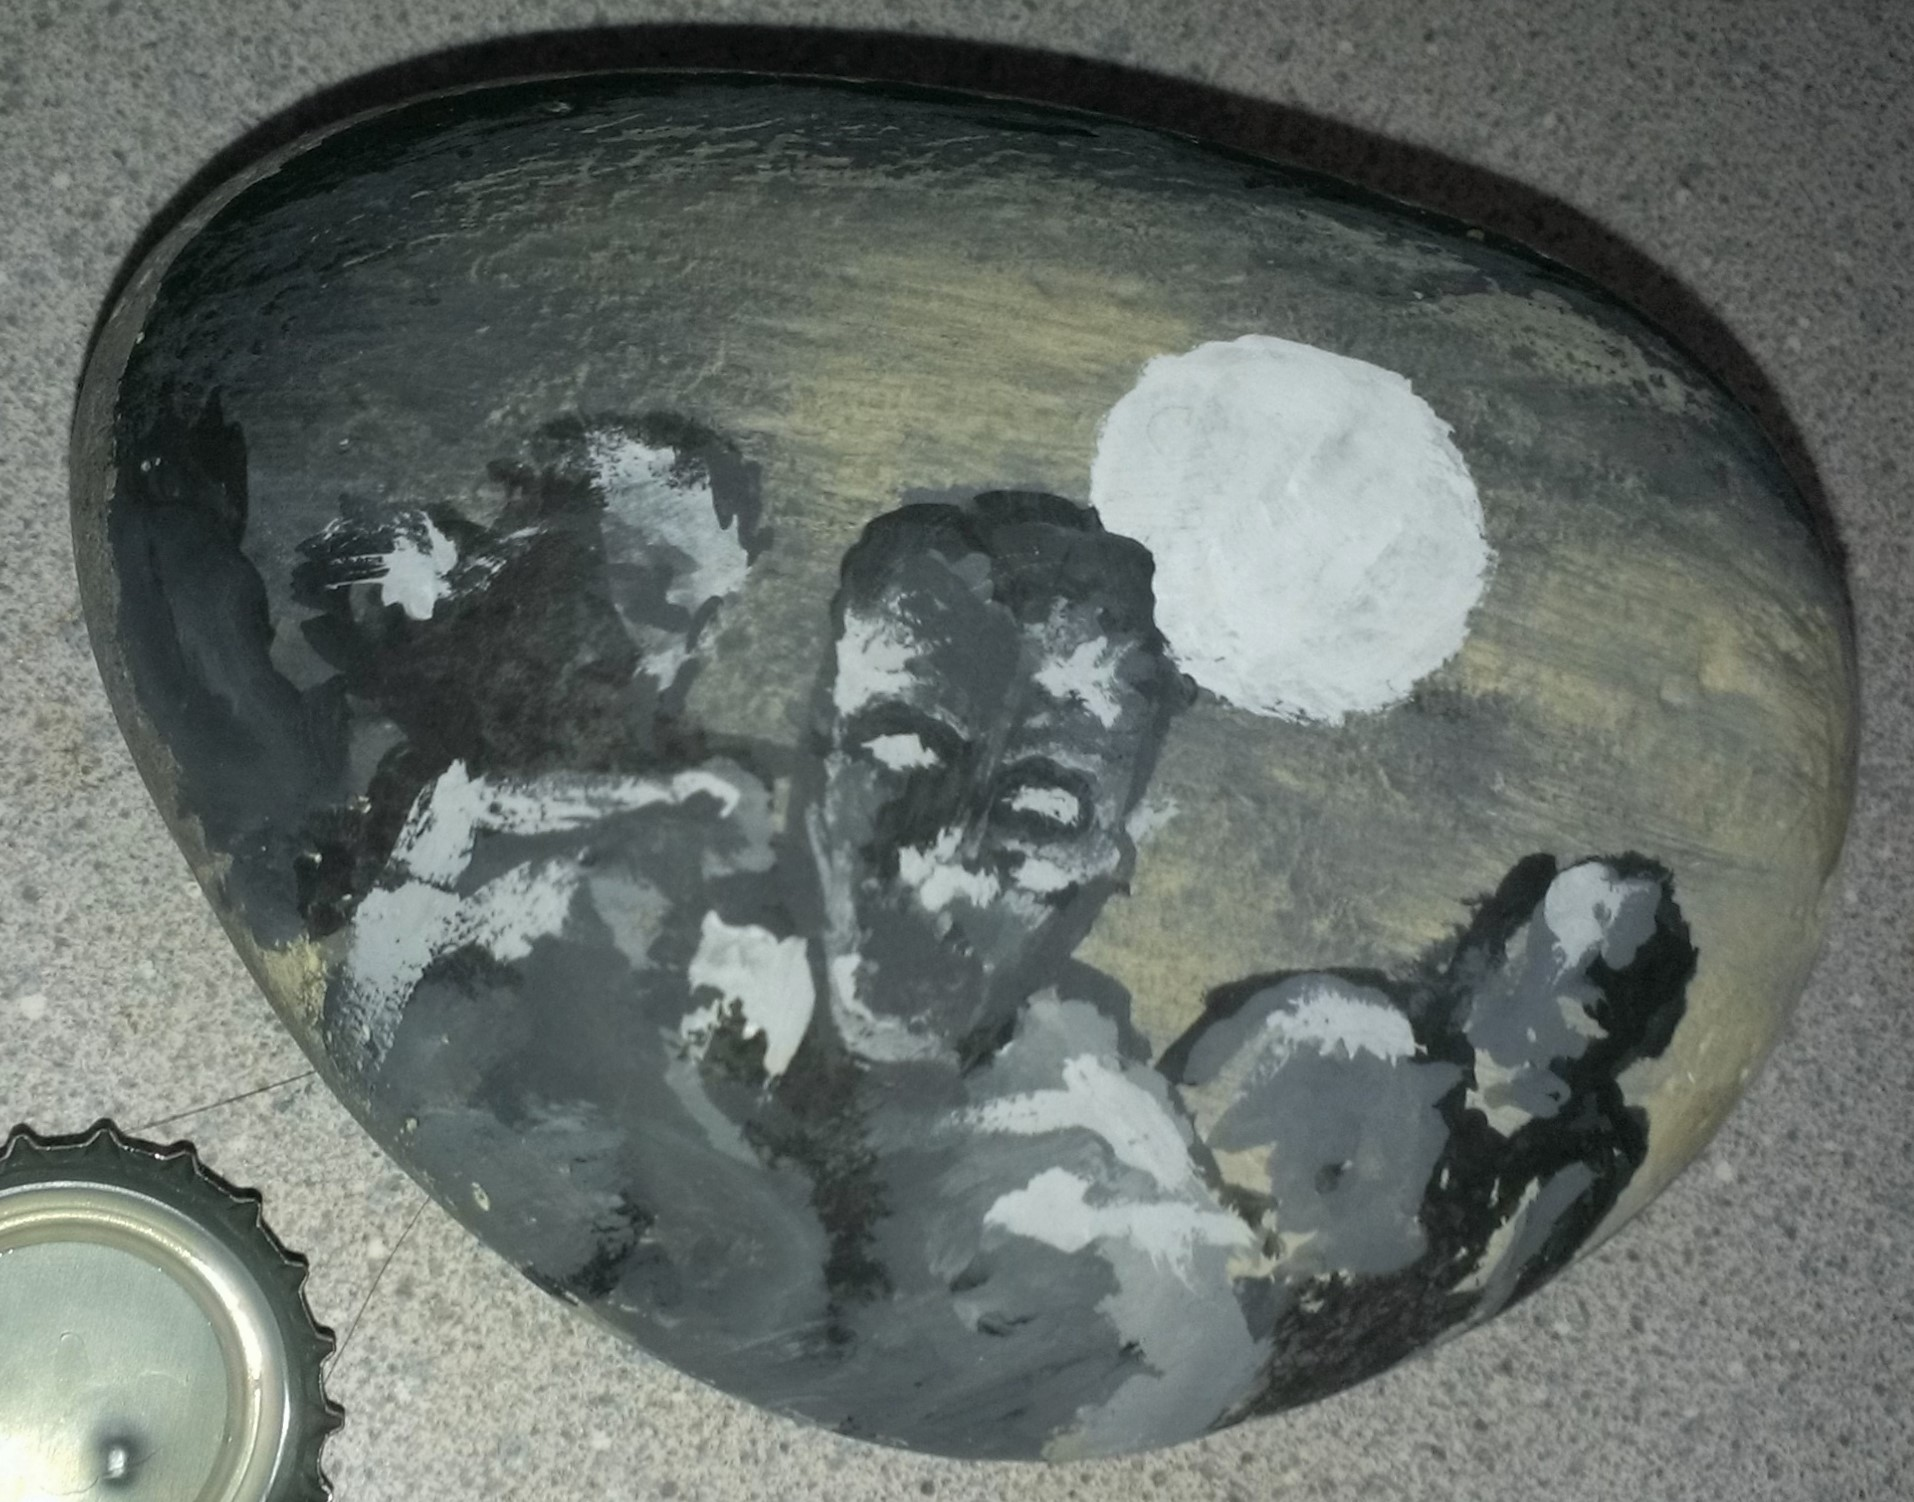 acrylic on stone